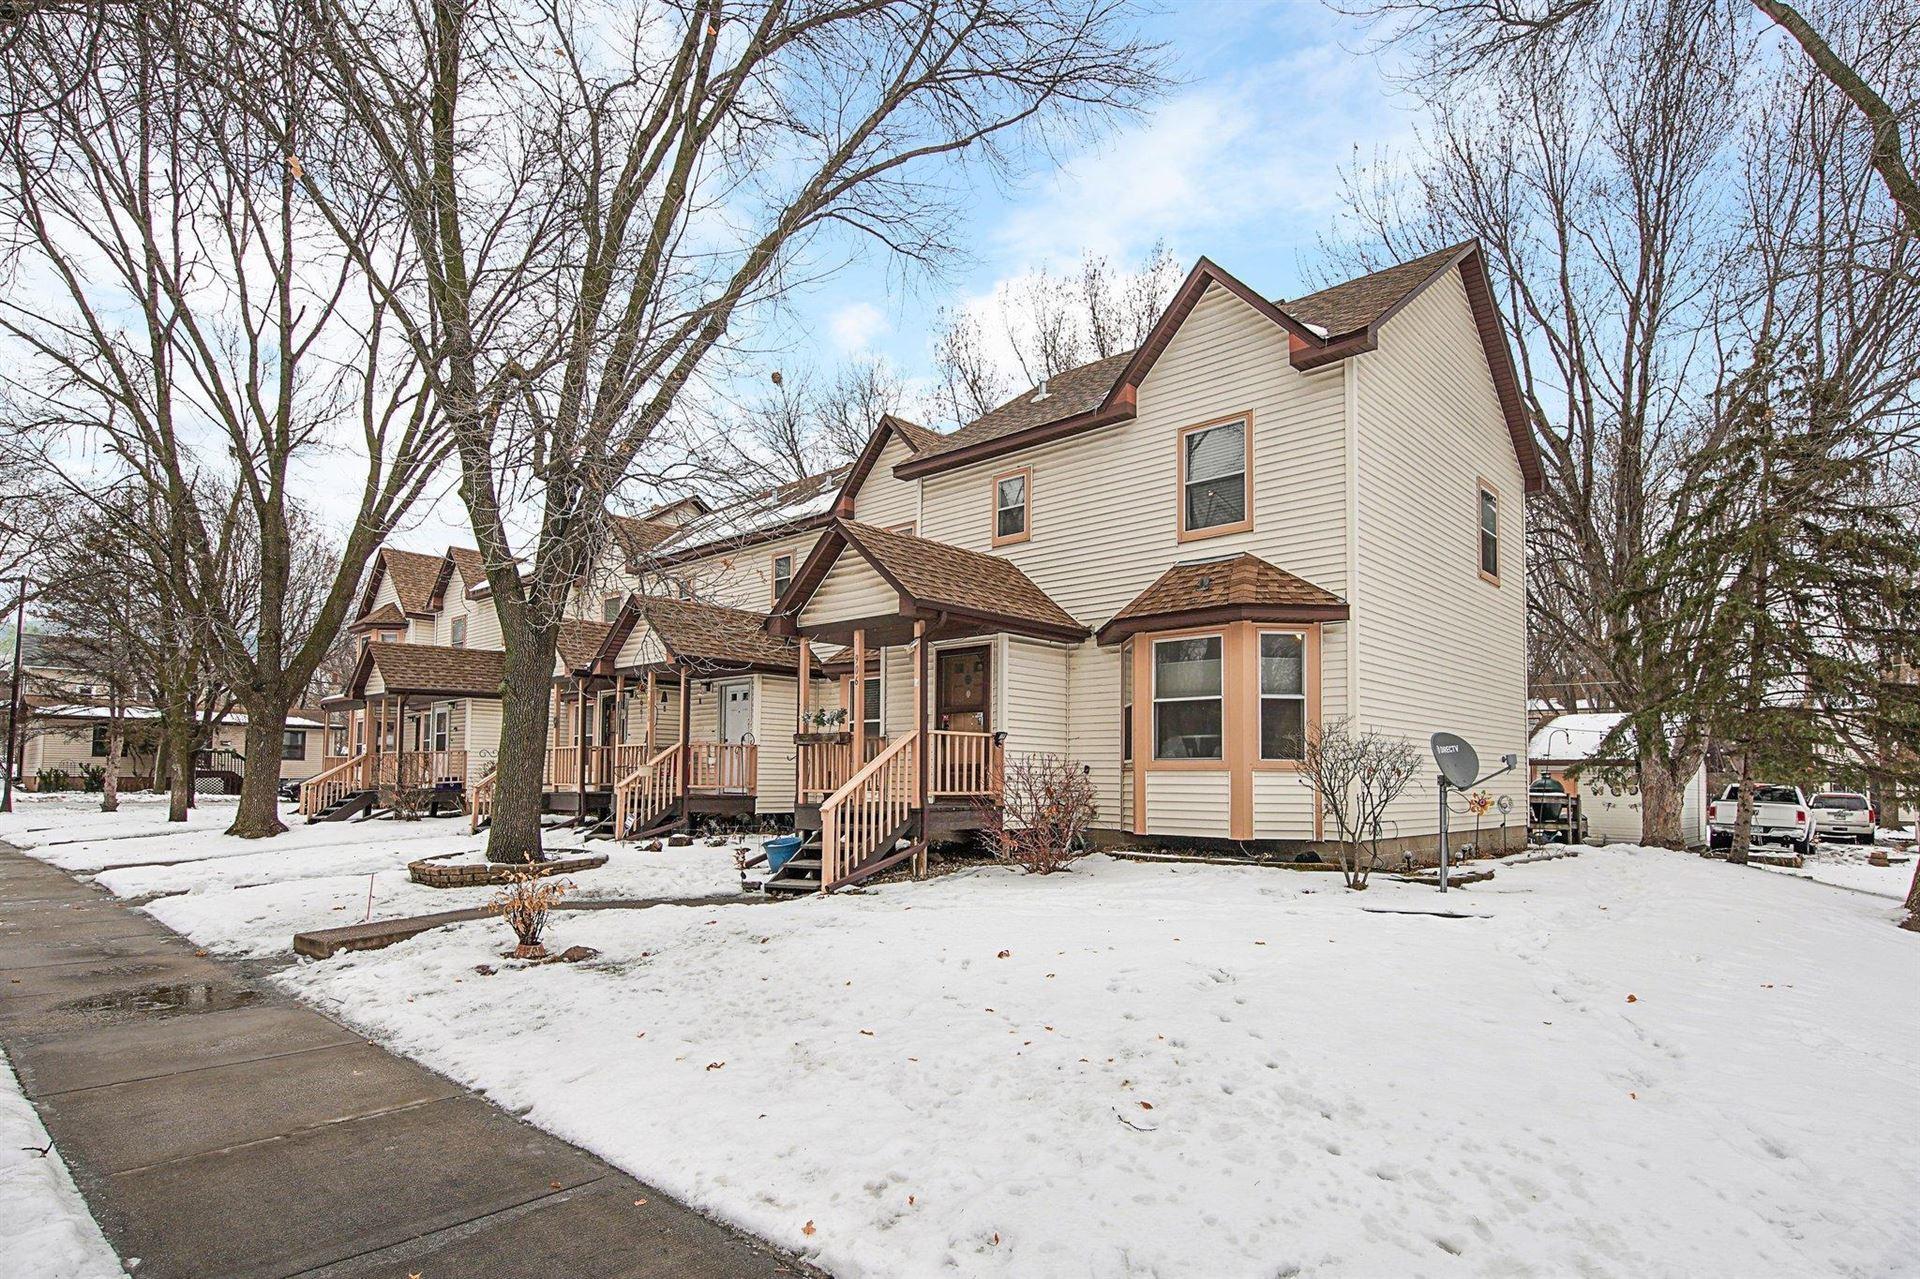 Photo of 906 Galtier Street, Saint Paul, MN 55117 (MLS # 5701918)